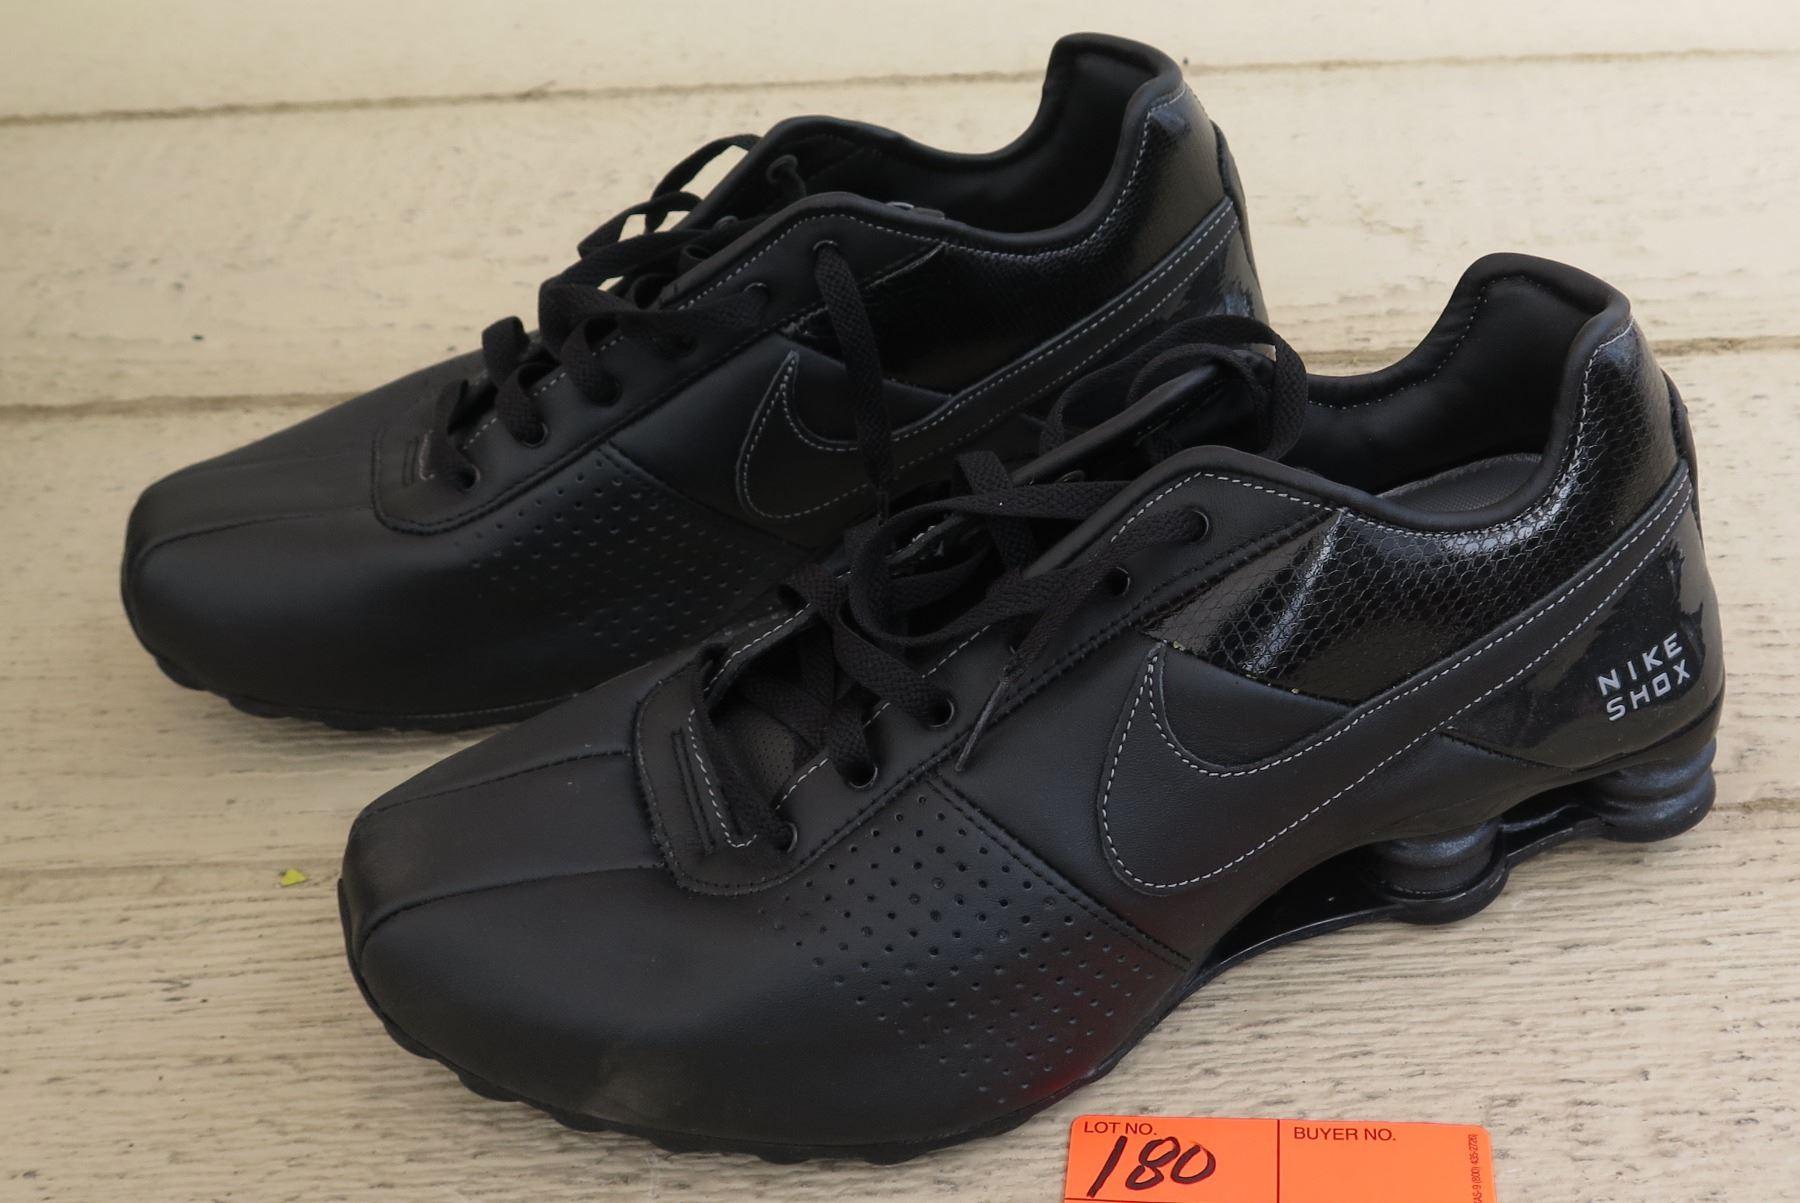 promo code 17736 d2616 Image 1   Men s Nike Shox Shoes - Size 11 ...